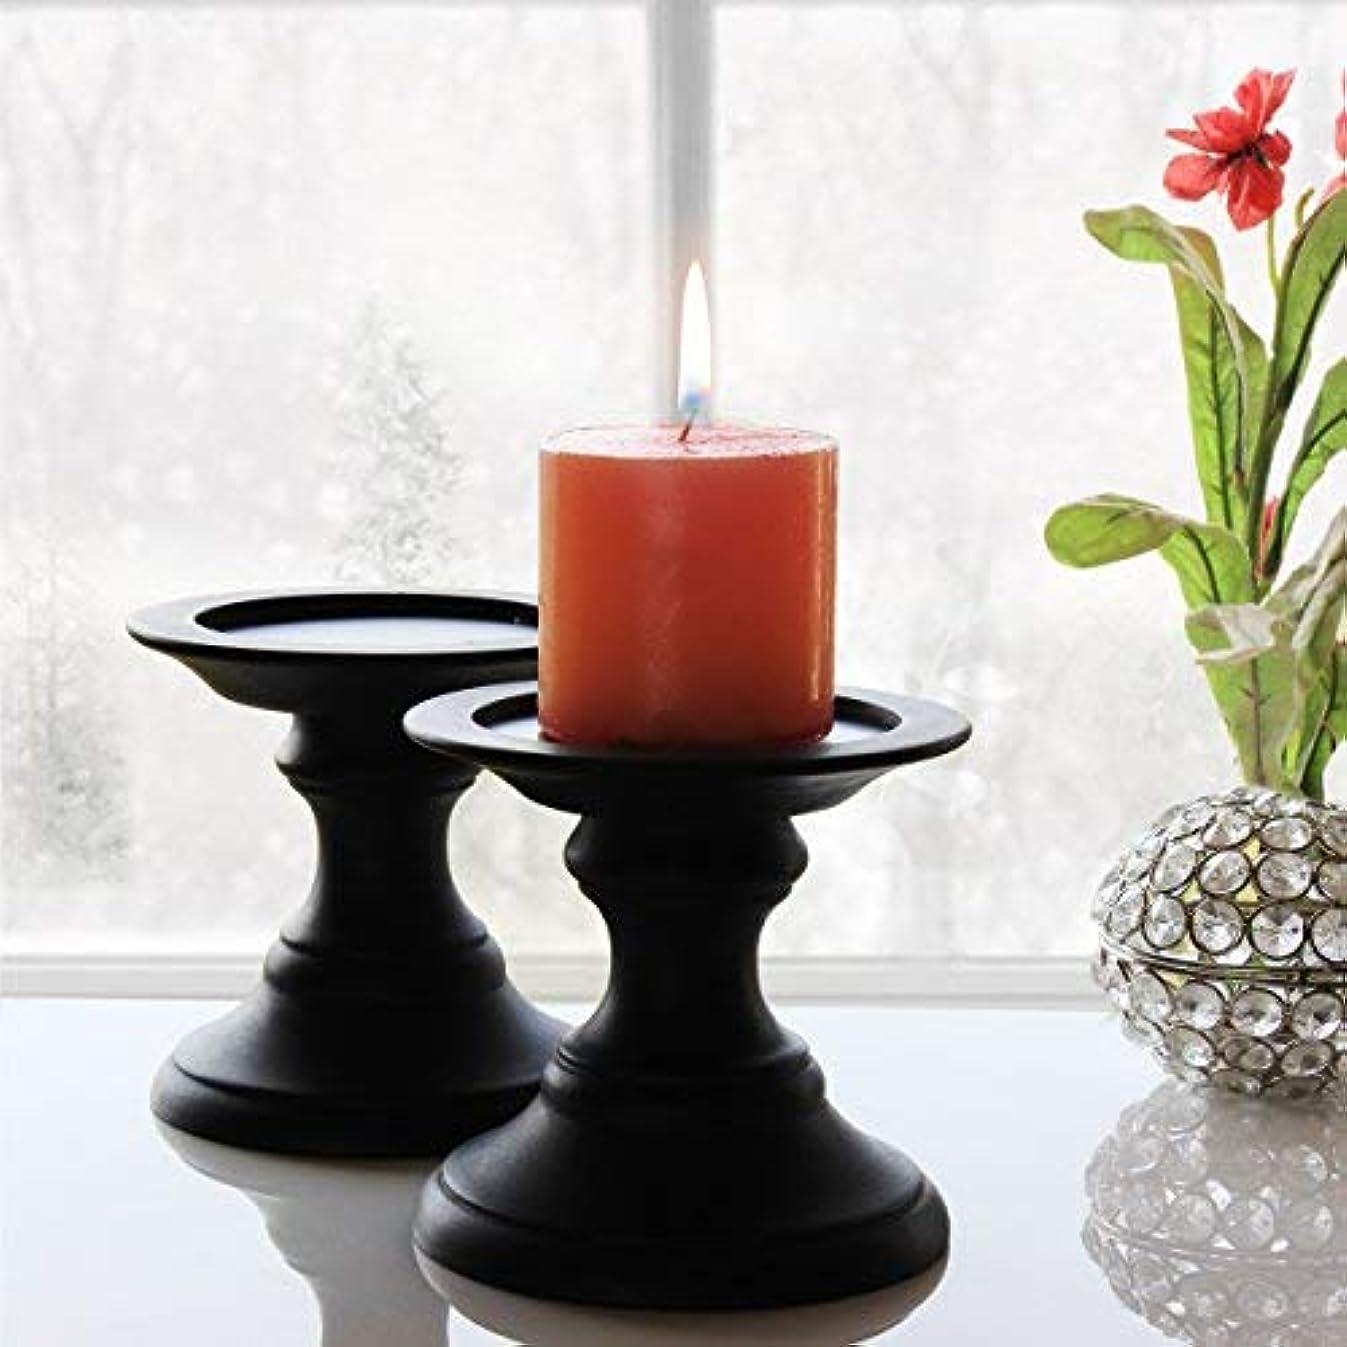 storeindya Decorations metal Incense Tower & Ash Catcher Christmas Home Décor Accessory (Design 5)